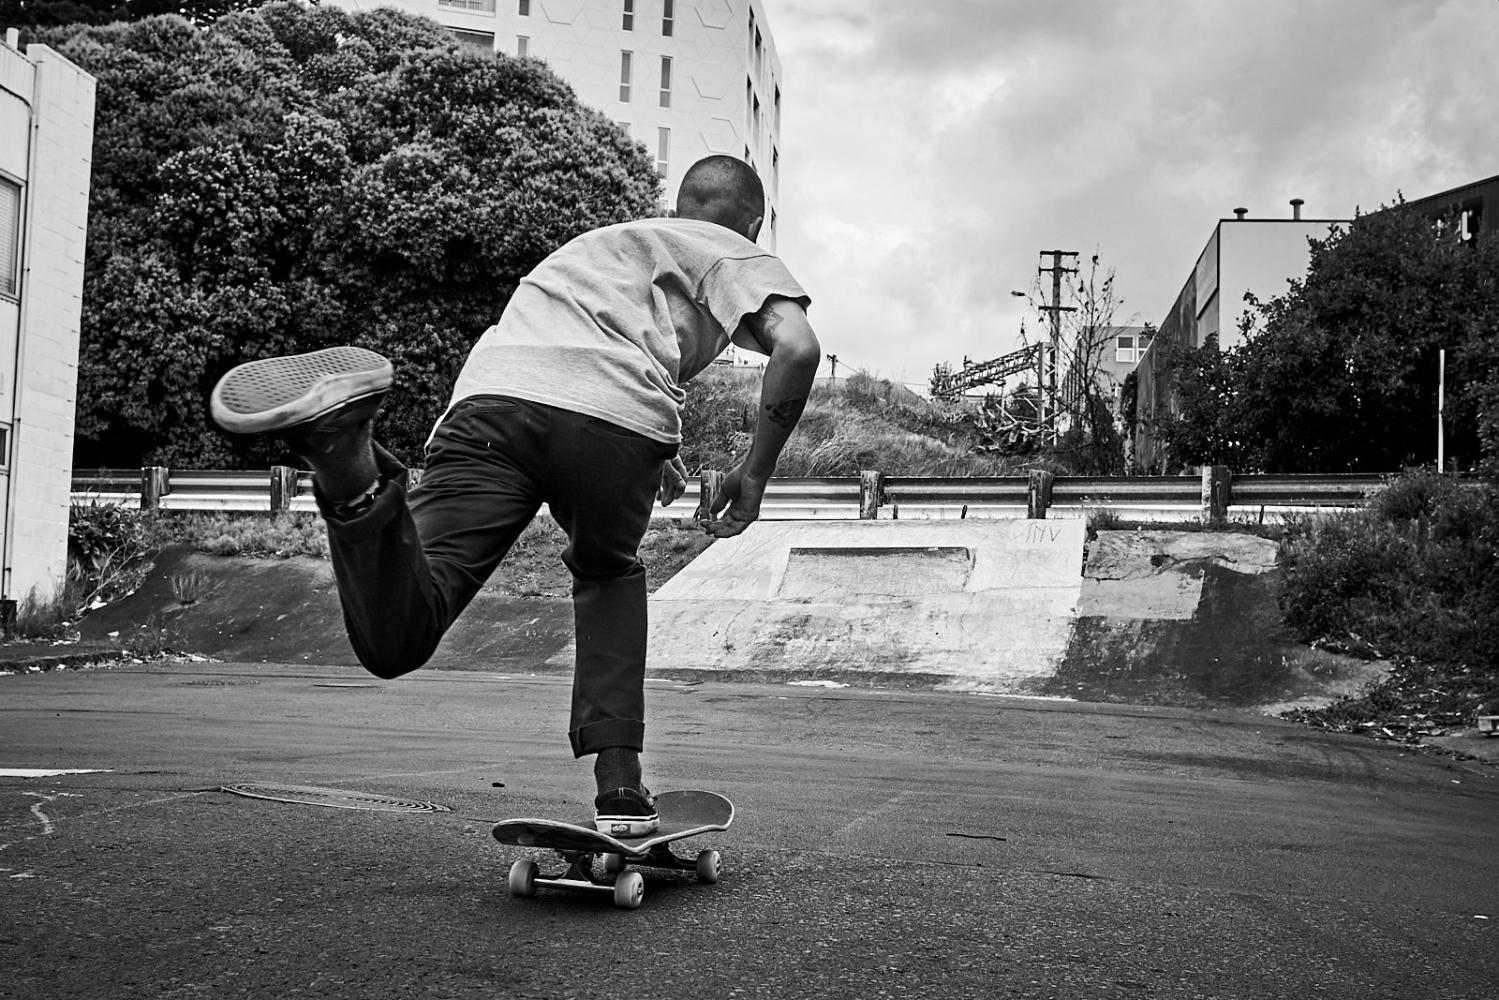 Photography image - Loading skate_culture75.jpg